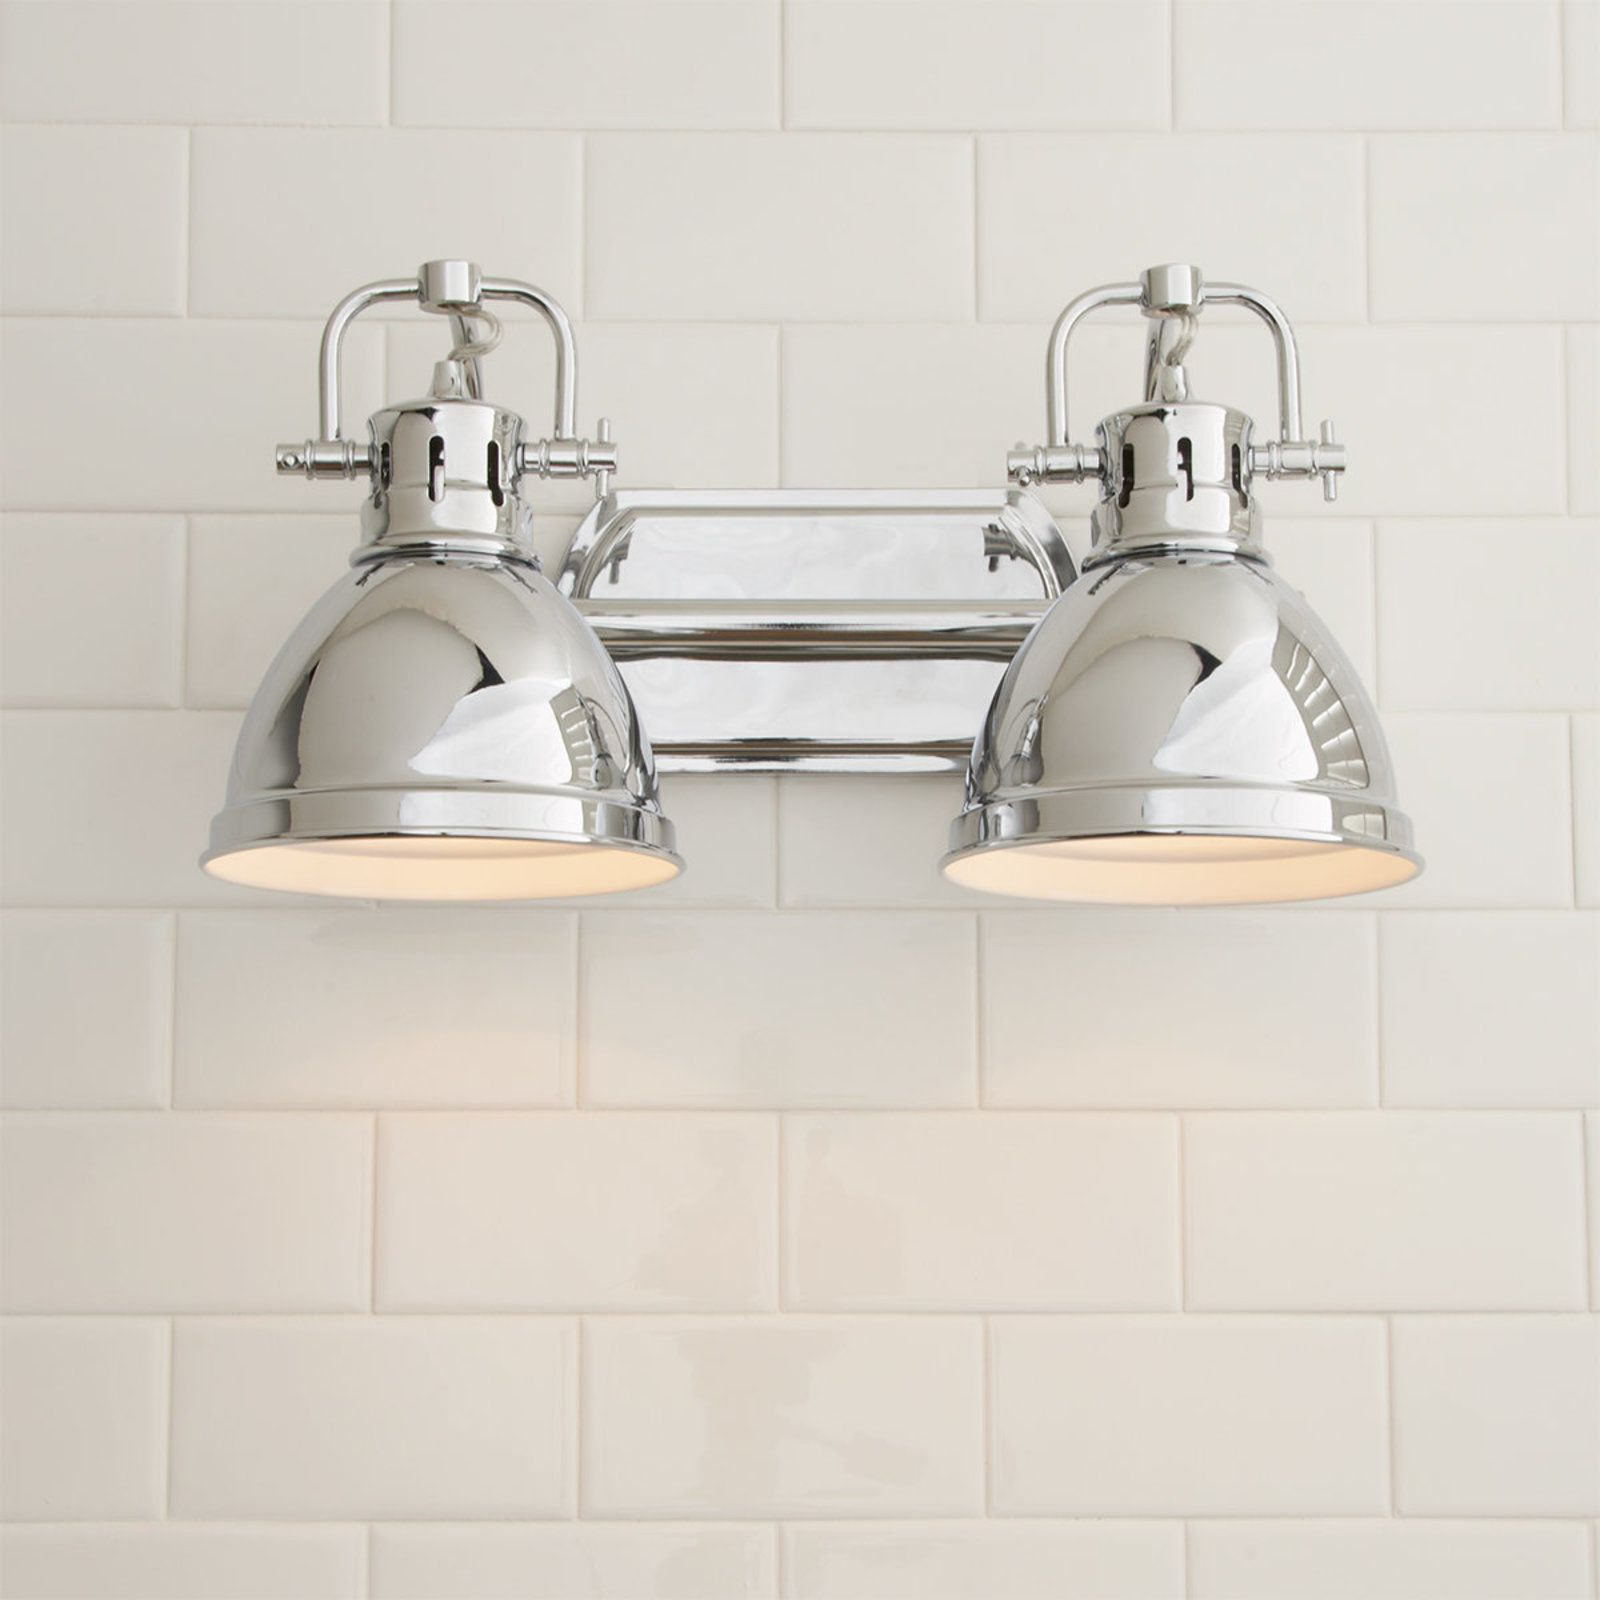 Classic Dome Shade Bath Light 2 Light Bath Light Bathroom Light Fixtures Classic Dome